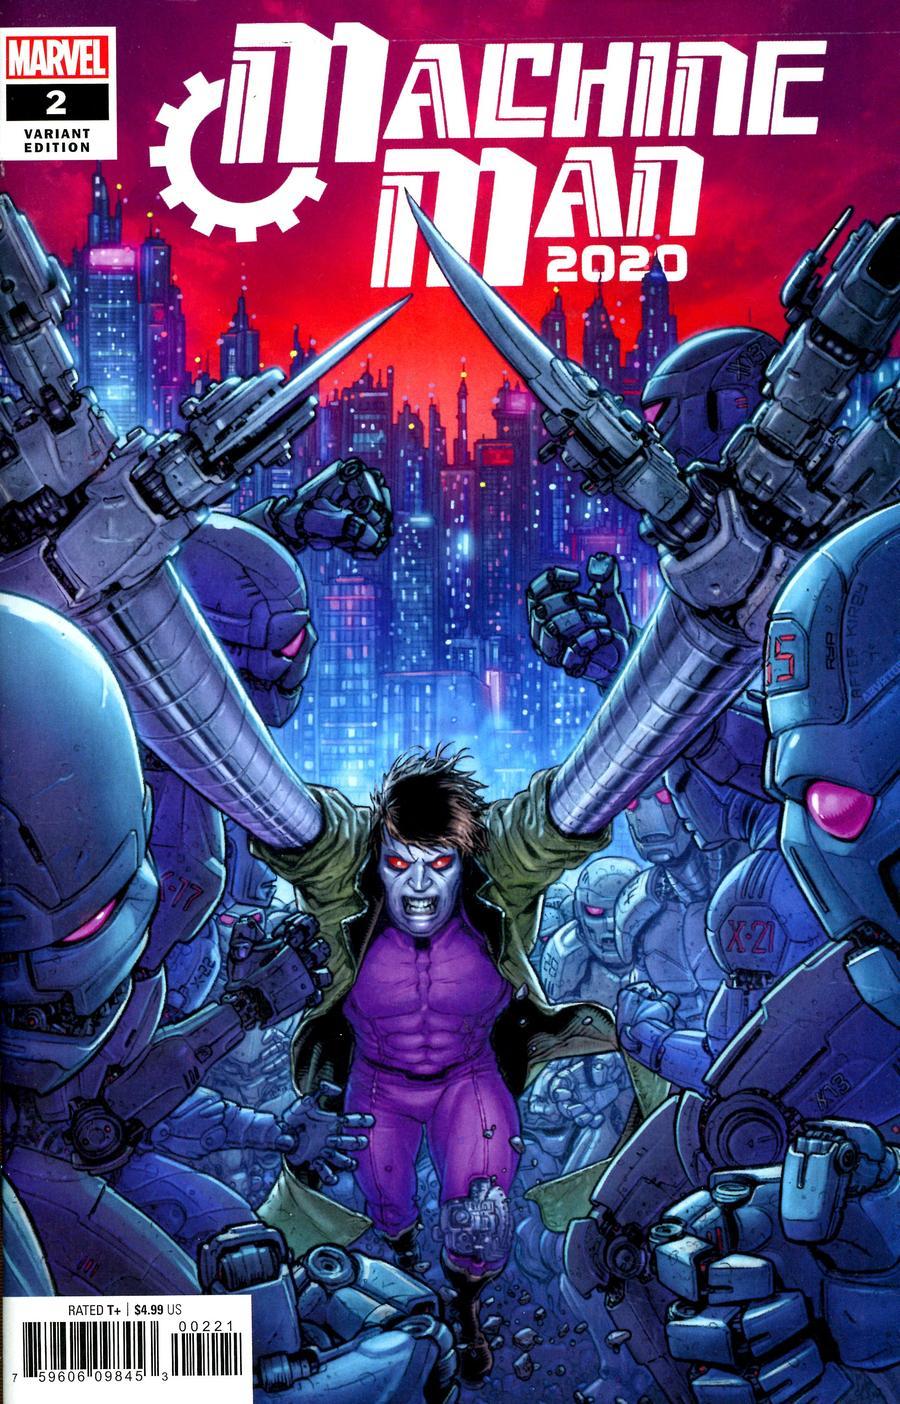 2020 Machine Man #2 Cover B Variant Juan Jose Ryp Cover